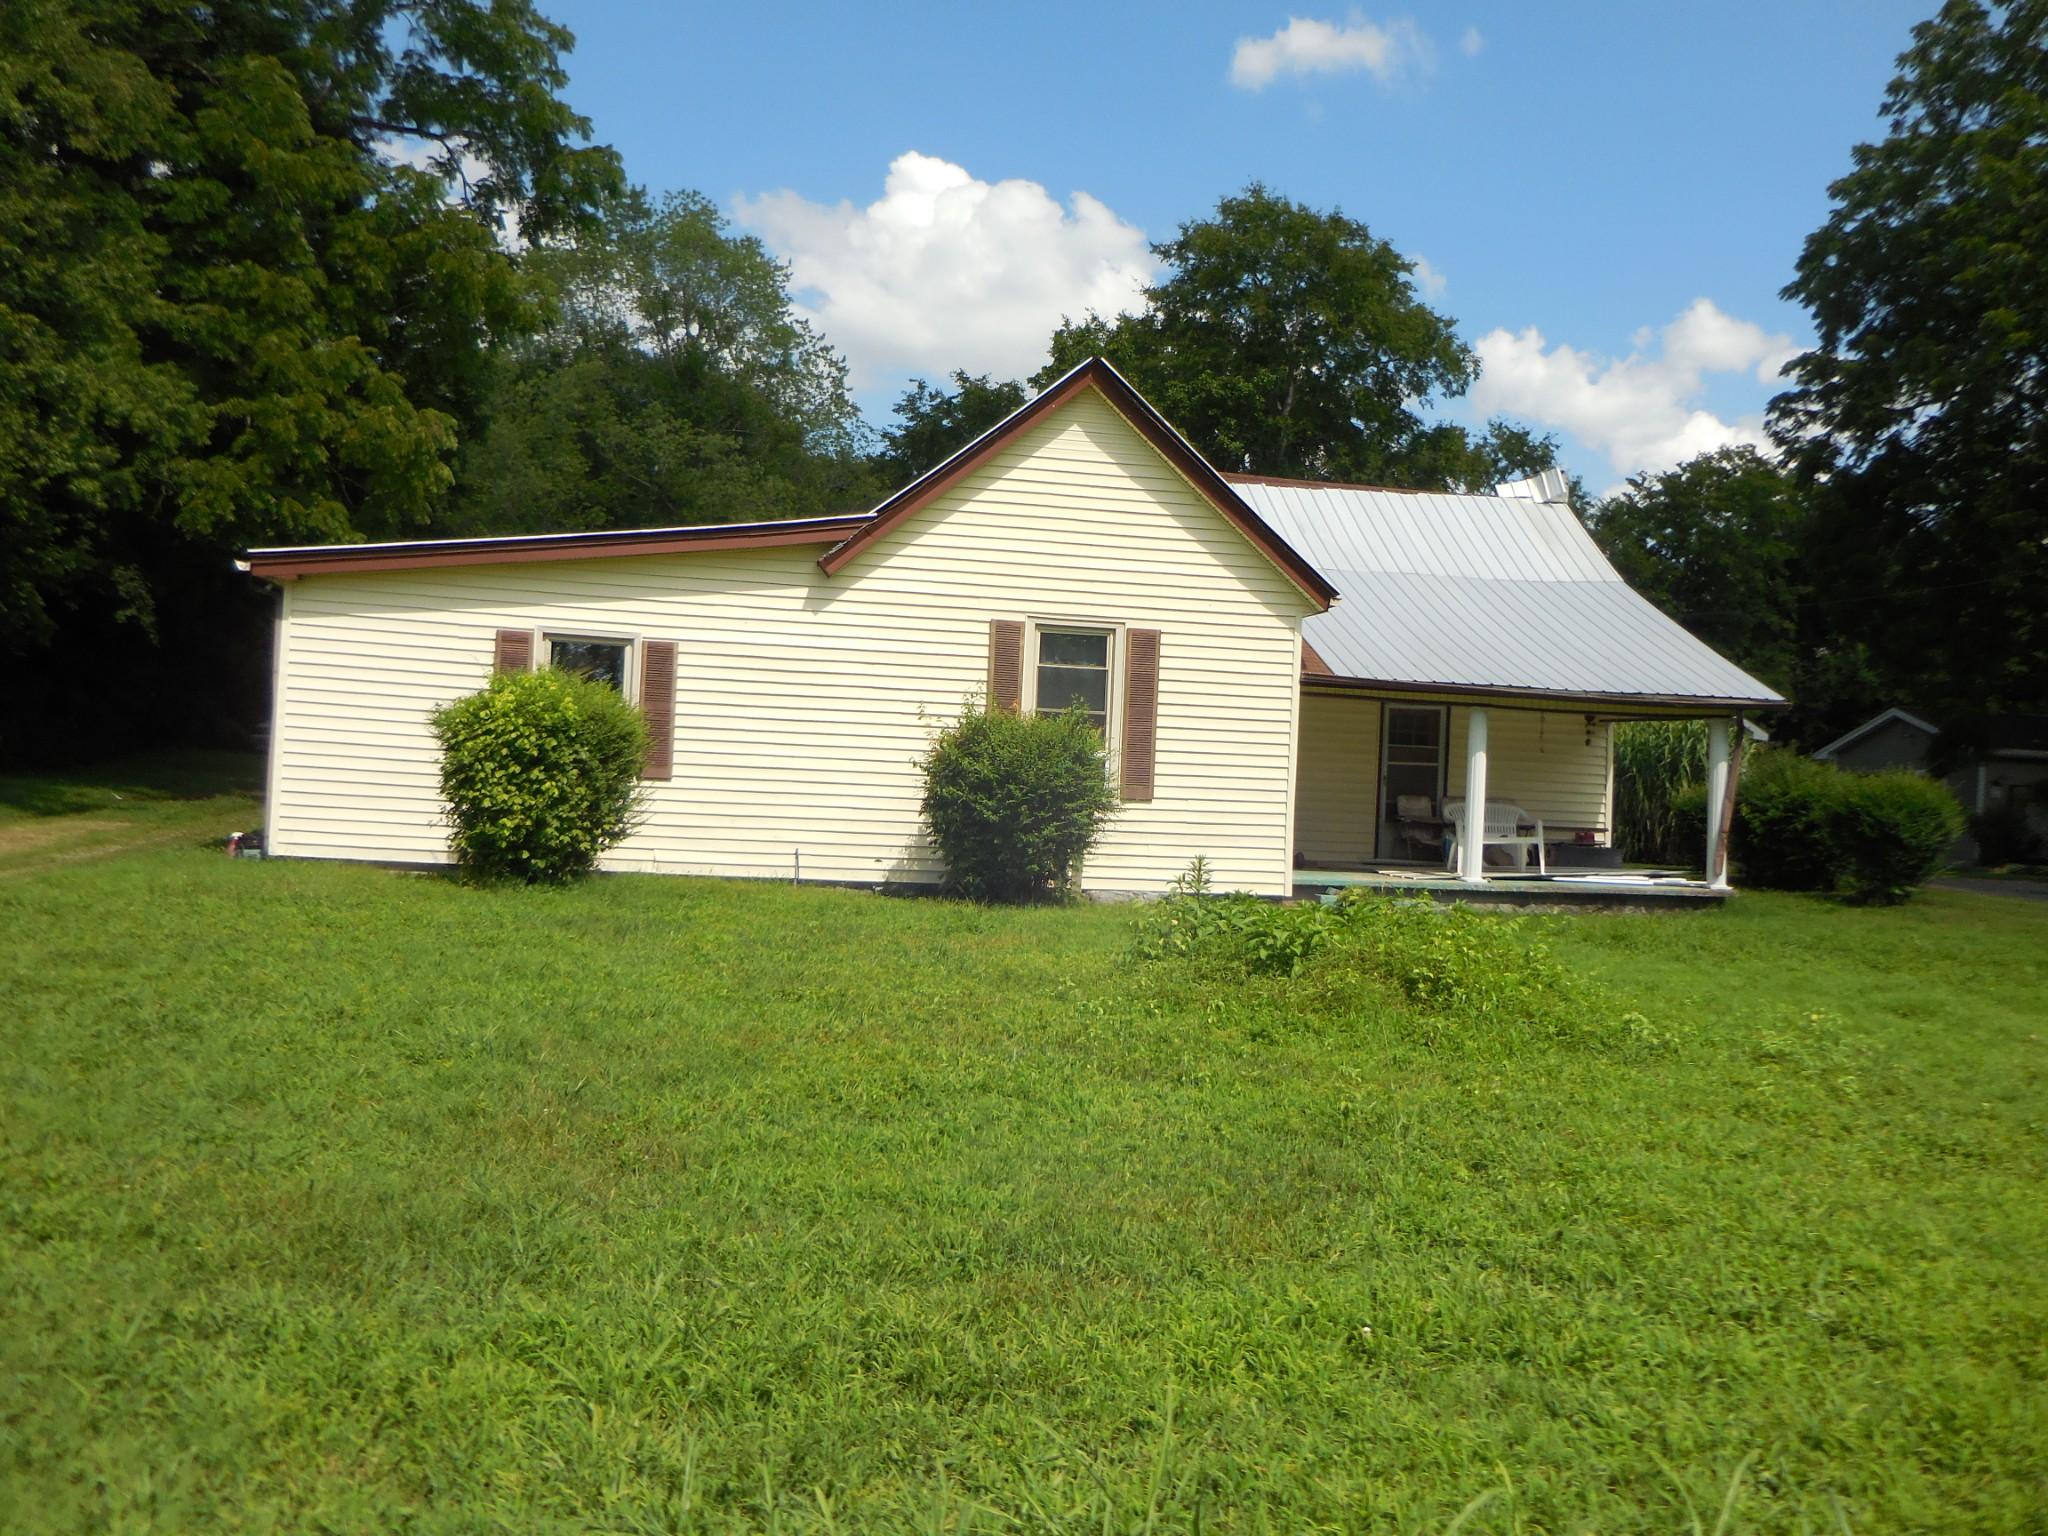 14 Brown Teal Rd Property Photo - Petersburg, TN real estate listing